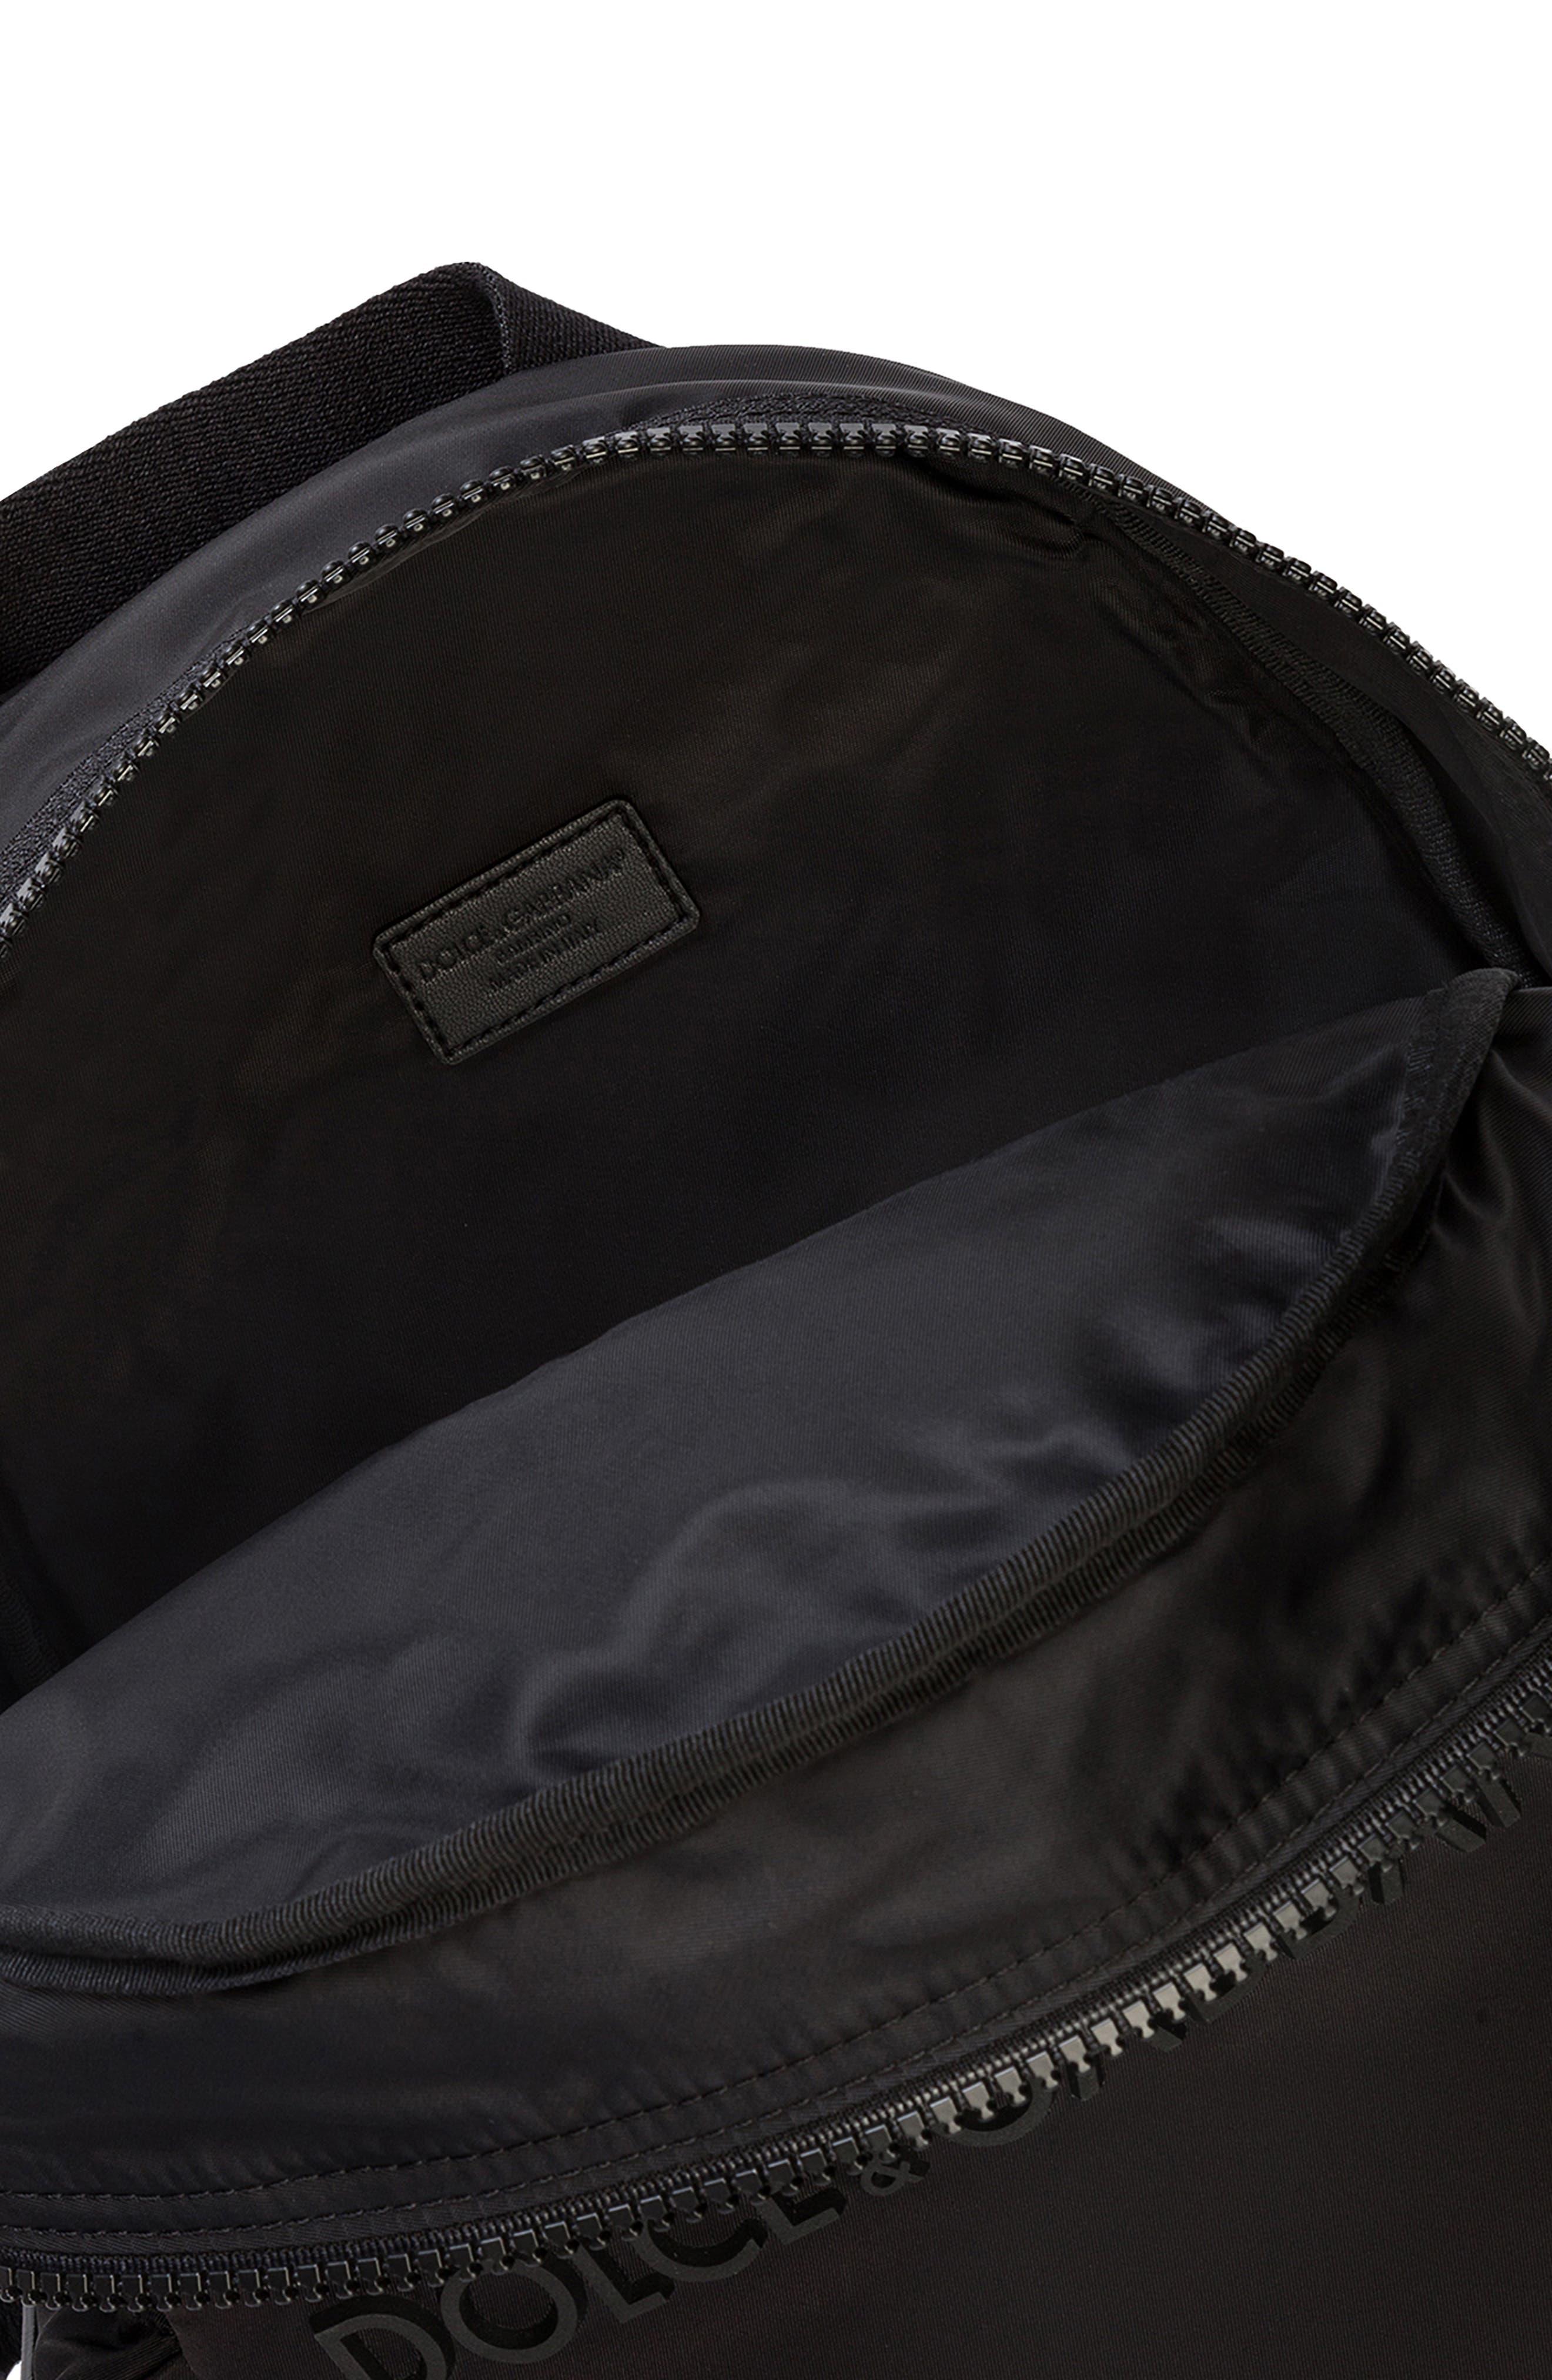 Zaino Nylon Backpack,                             Alternate thumbnail 3, color,                             NERO/ NERO